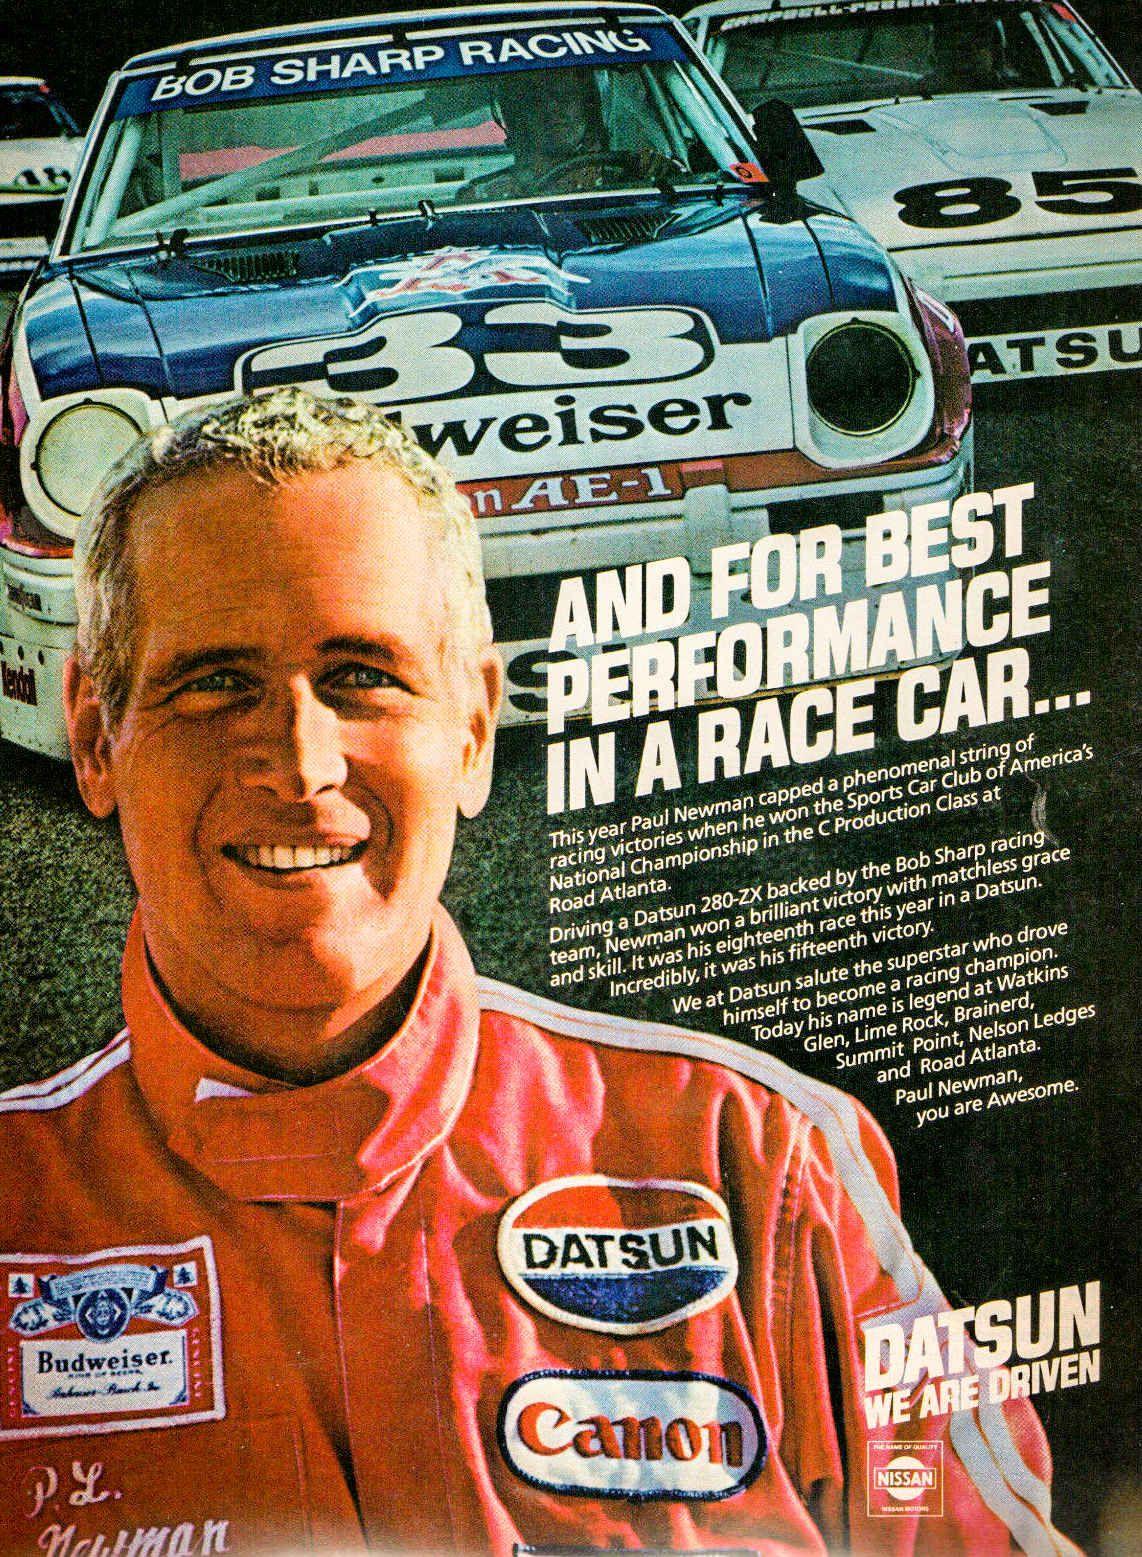 paul newman u0026 39 s datsun race car is for sale